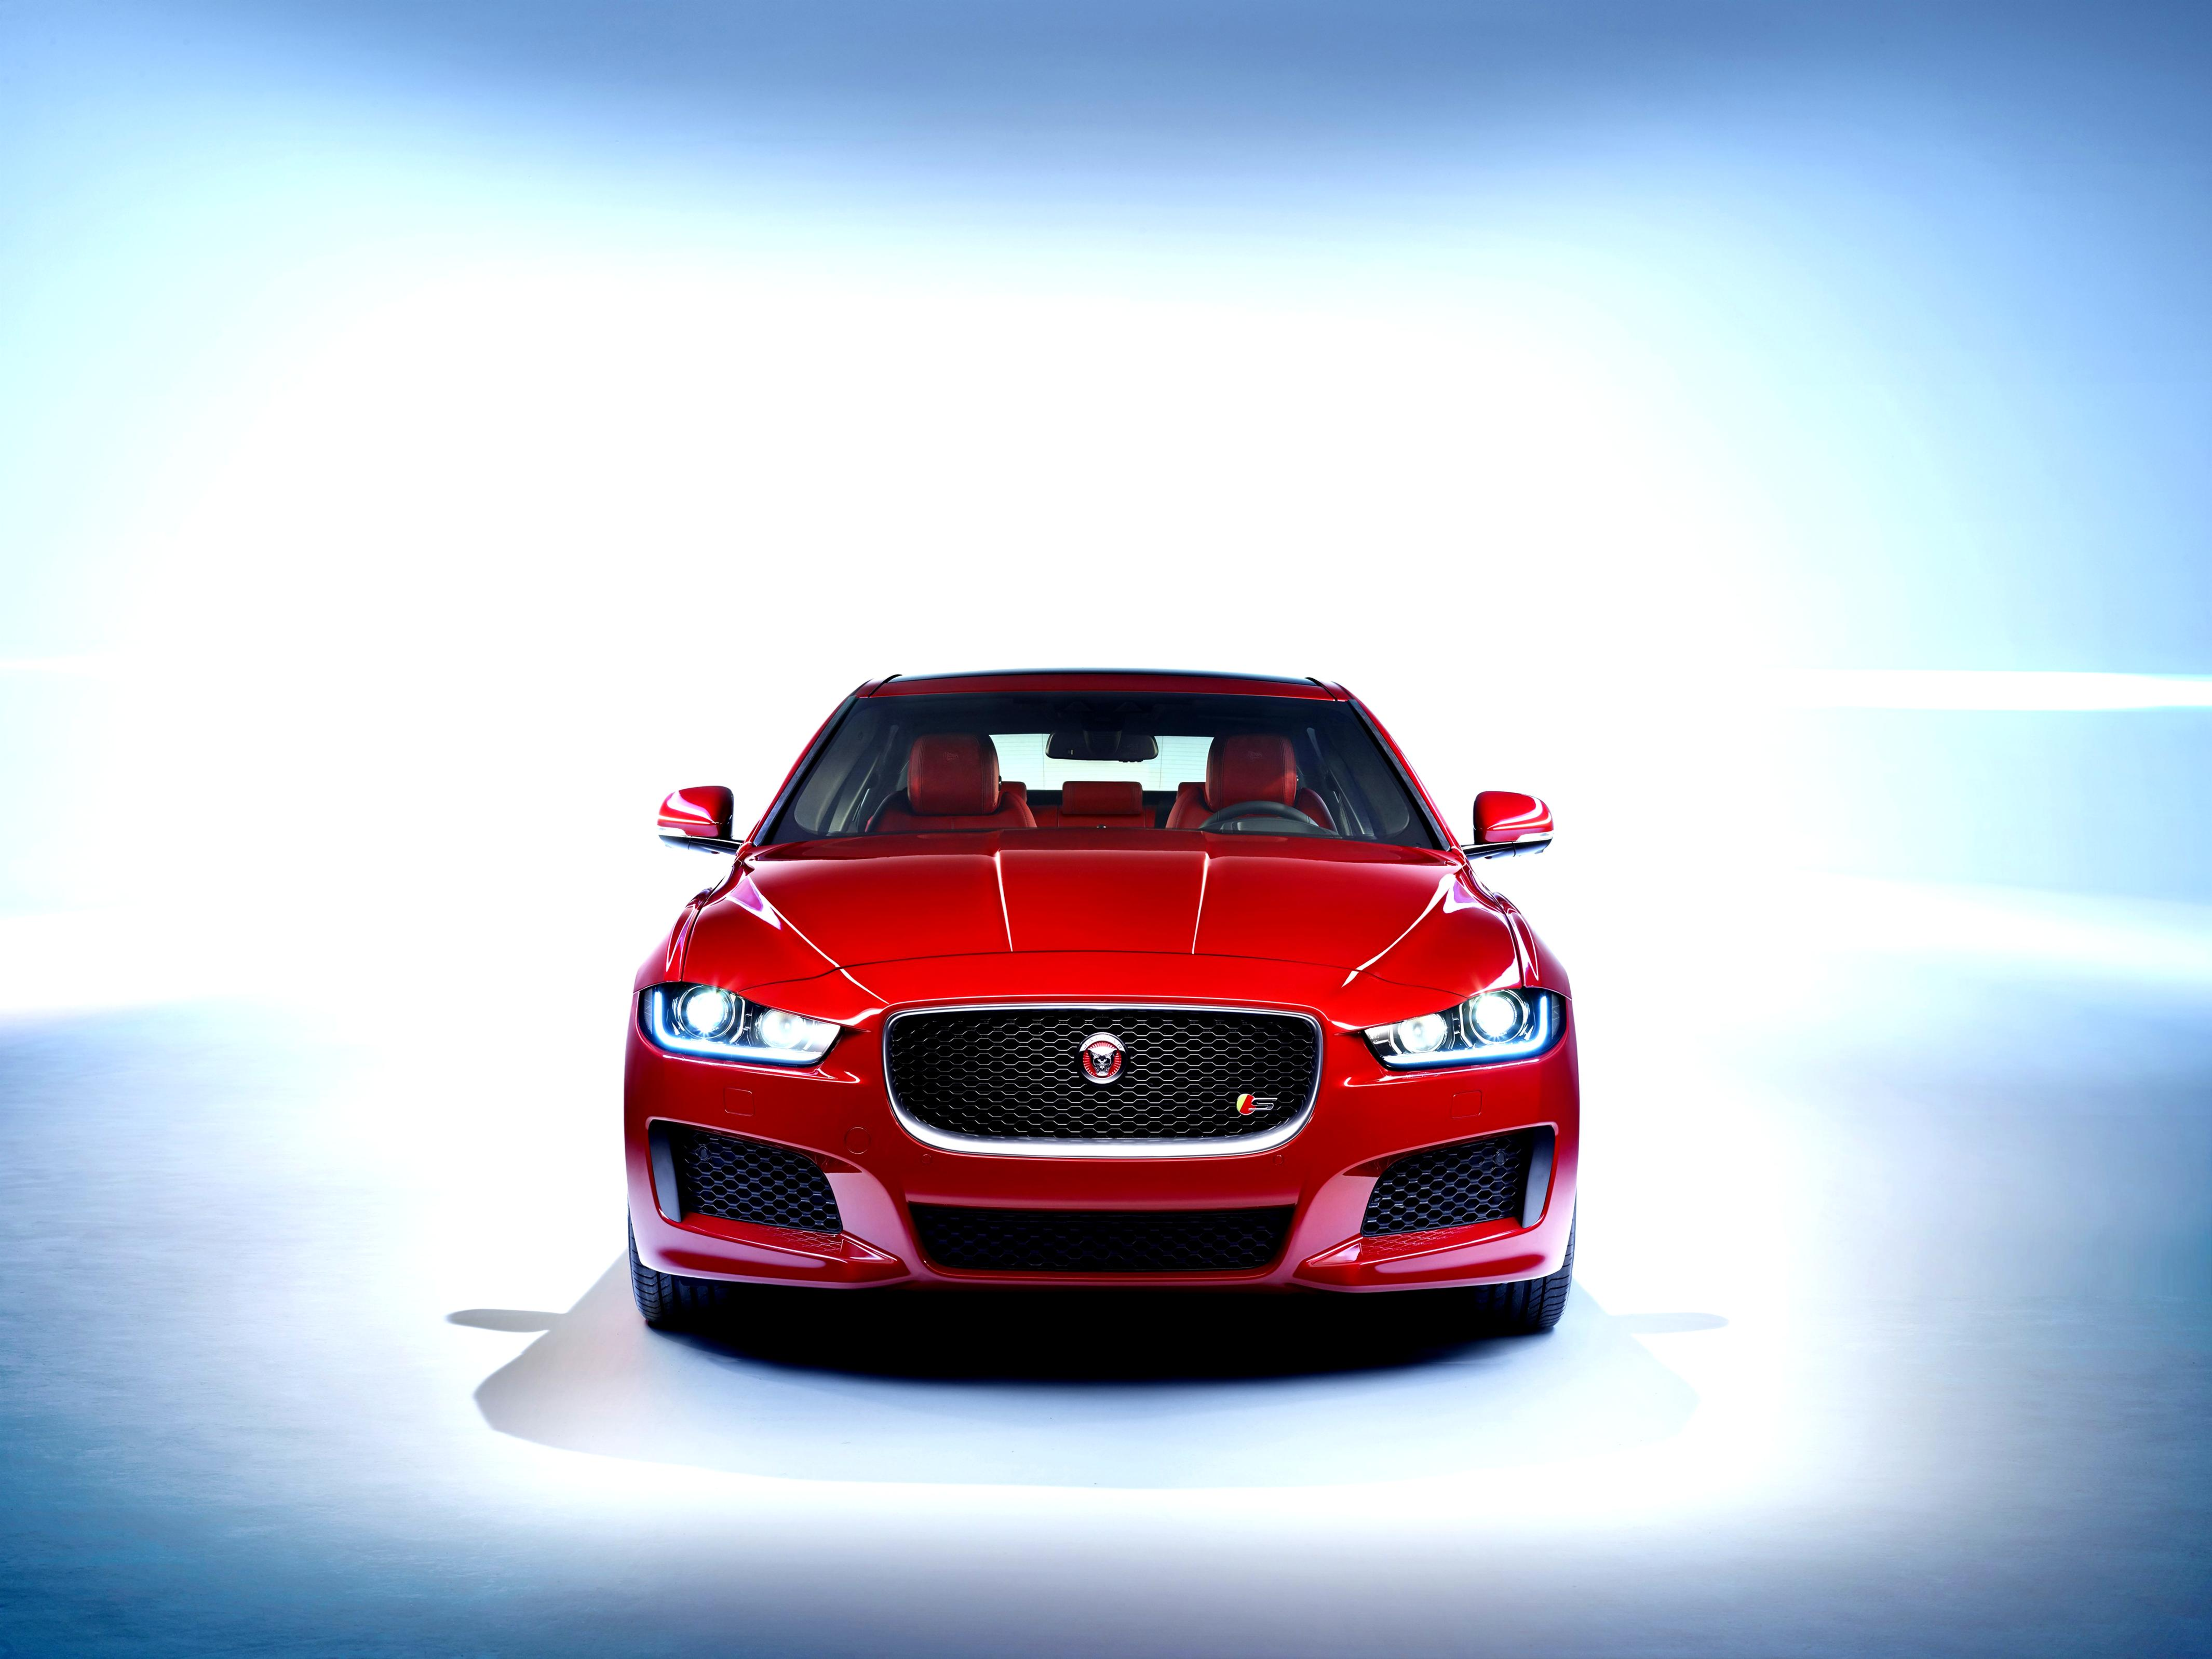 Jaguar XE 2014 on MotoImg.com